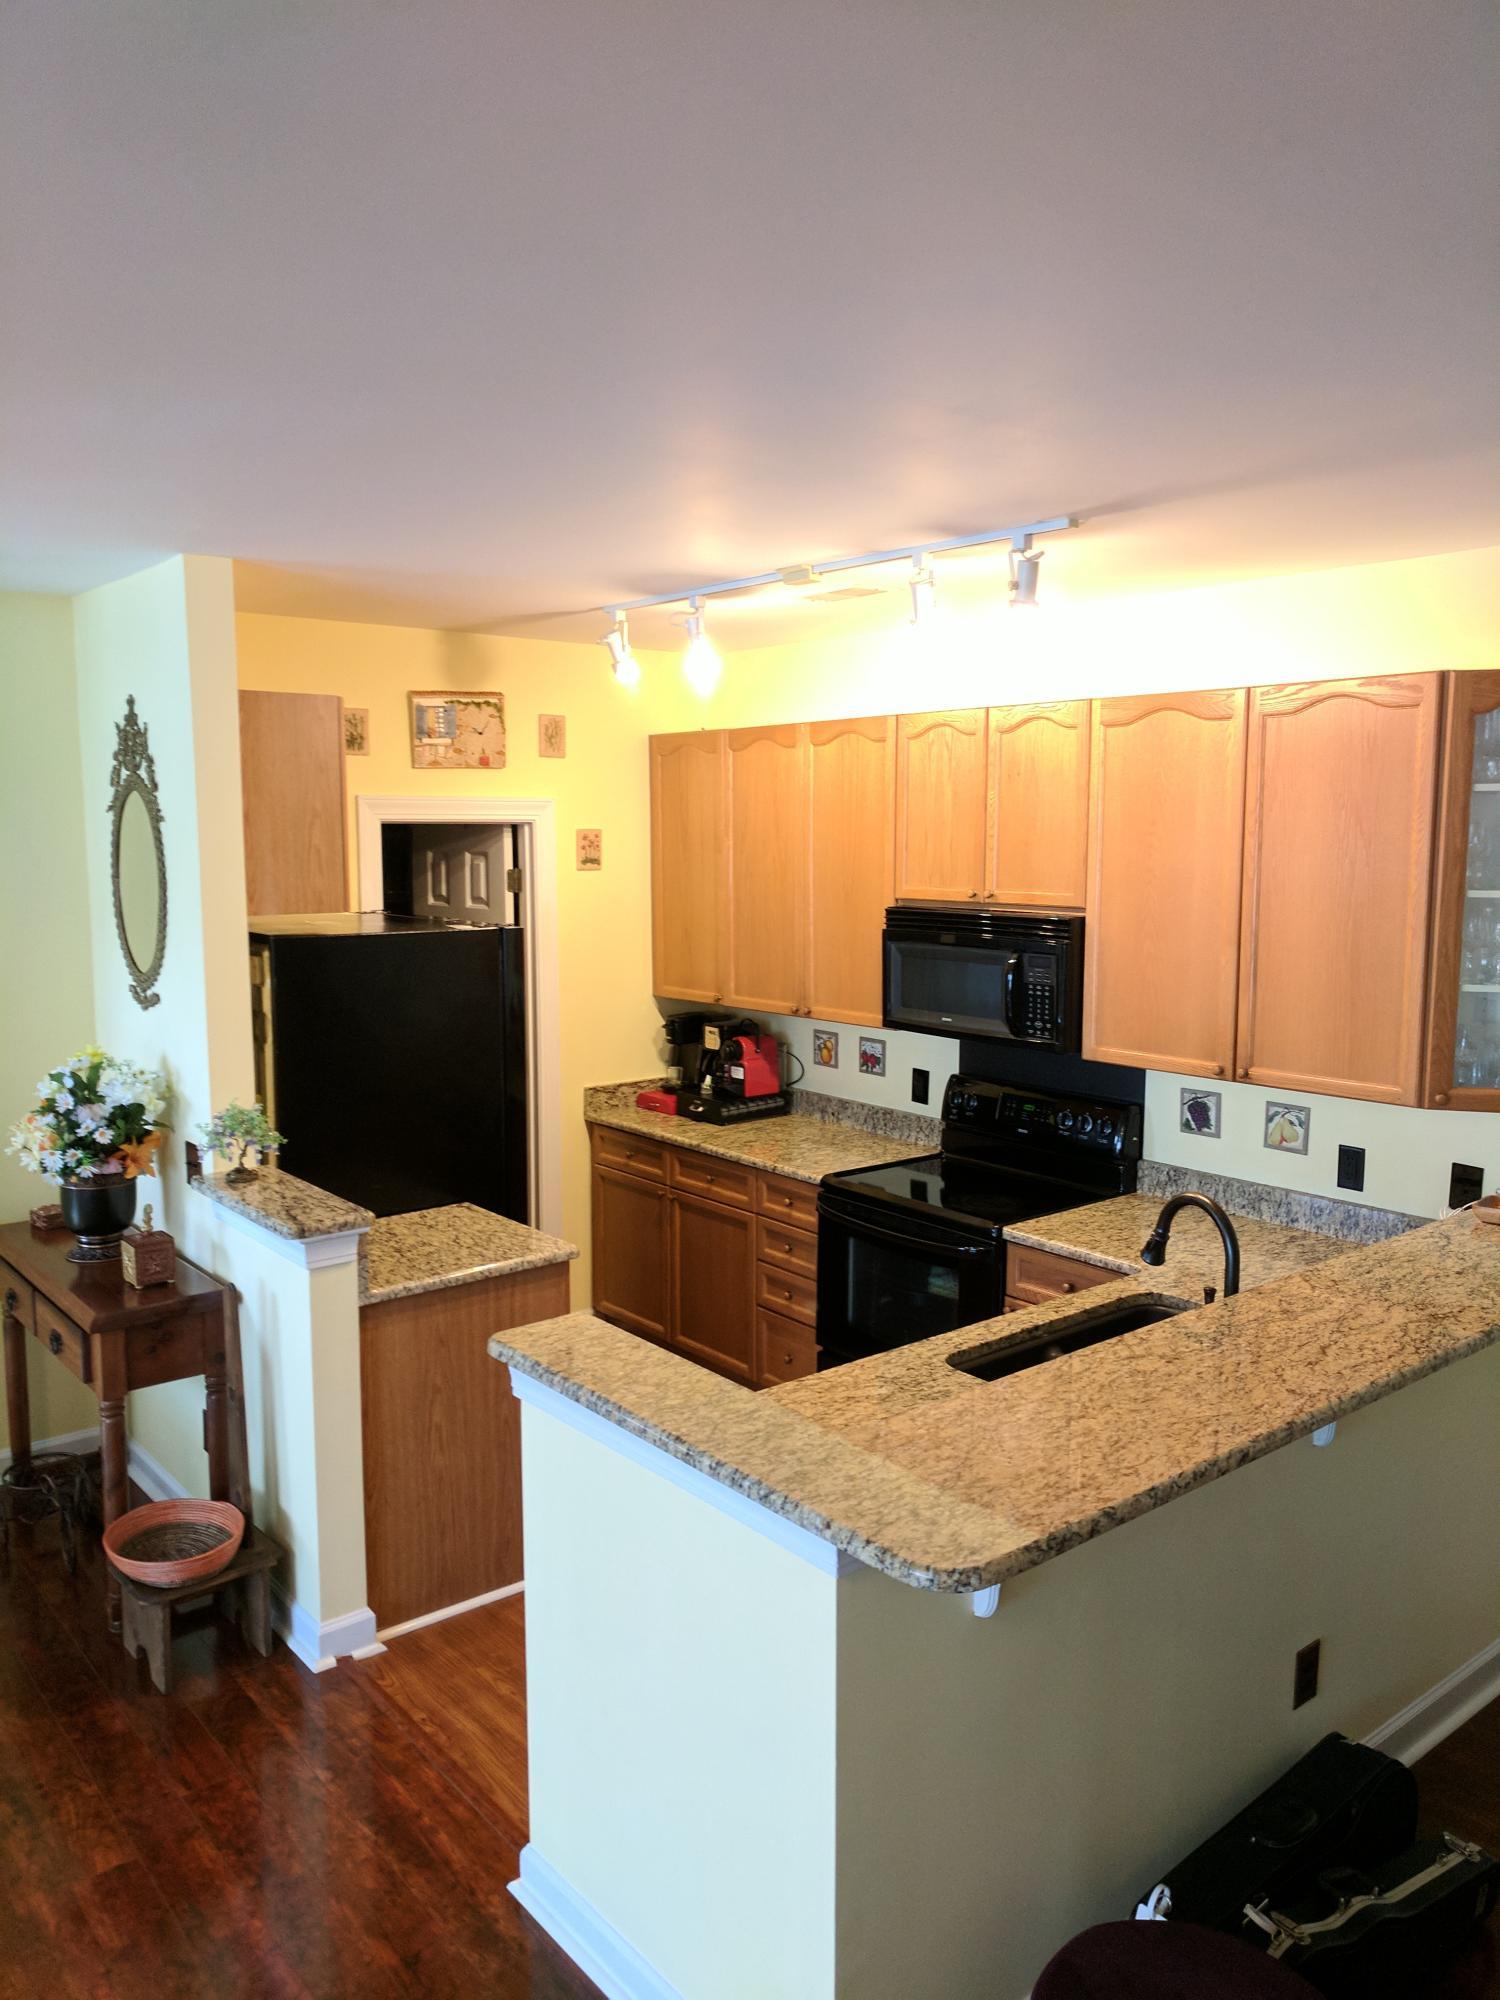 Dunes West Homes For Sale - 1362 Kingsford, Mount Pleasant, SC - 8